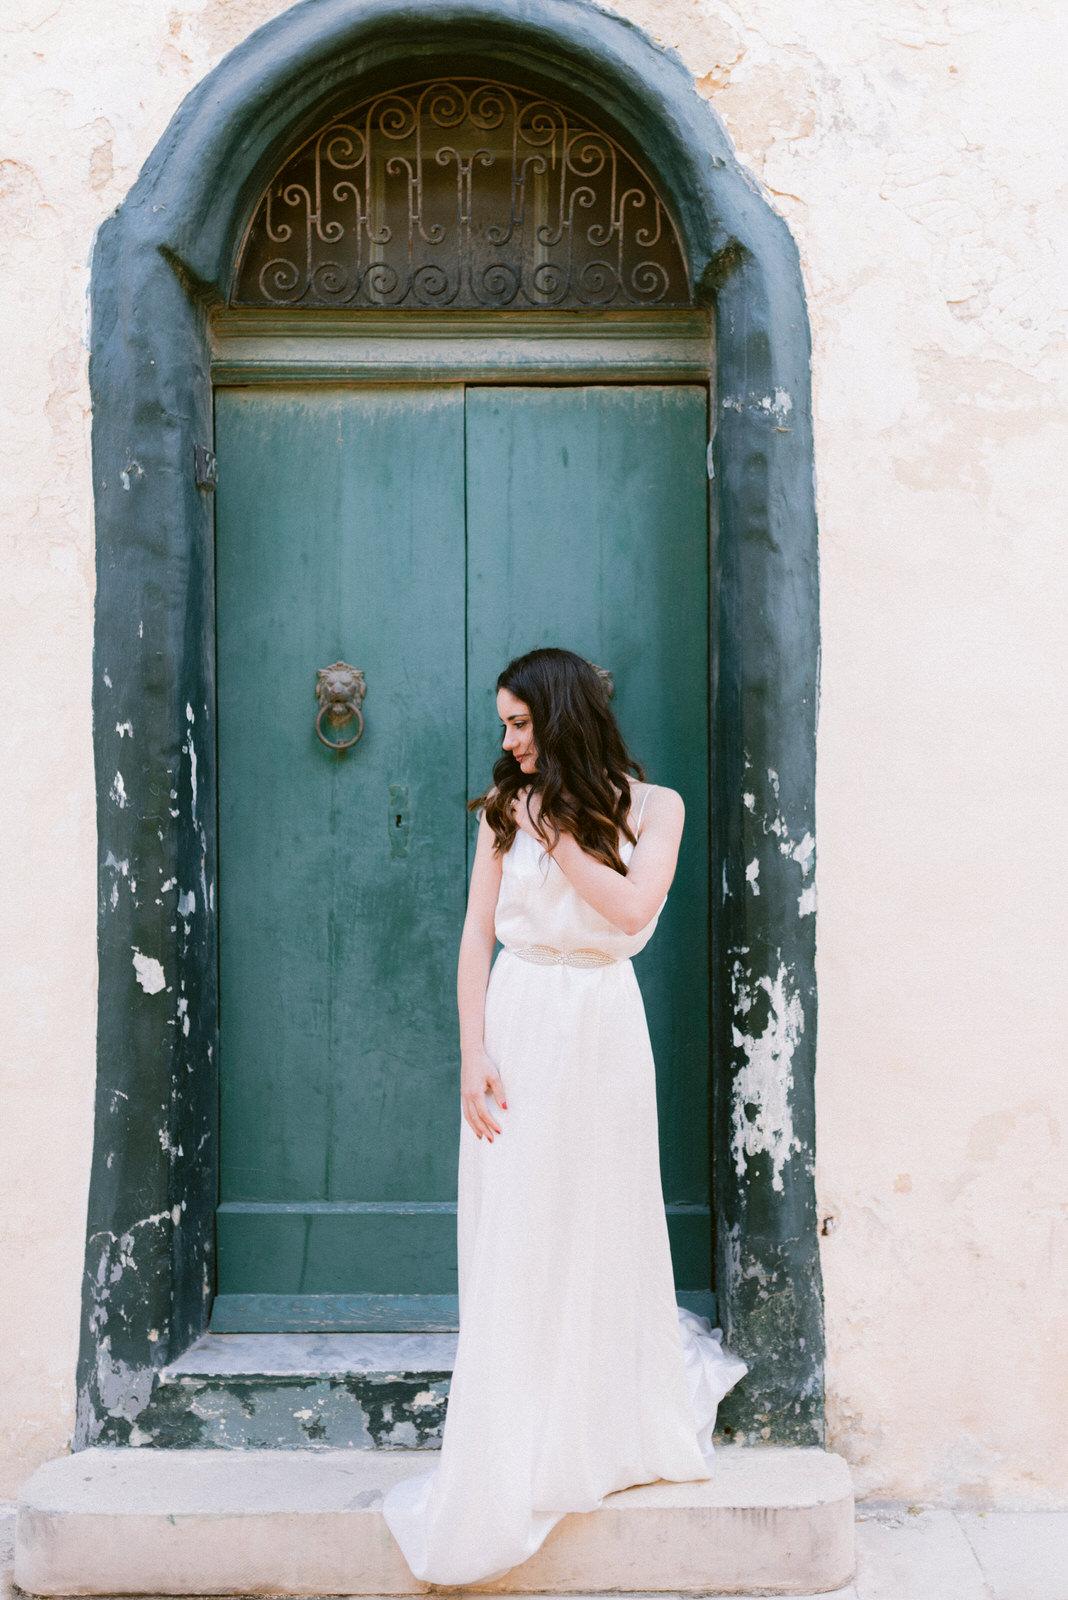 mdina wedding, malta wedding photography, malta elopement, golden bay malta wedding photos, wedding photographer malta, malta wedding venue, villa bologna wedding (53).jpg